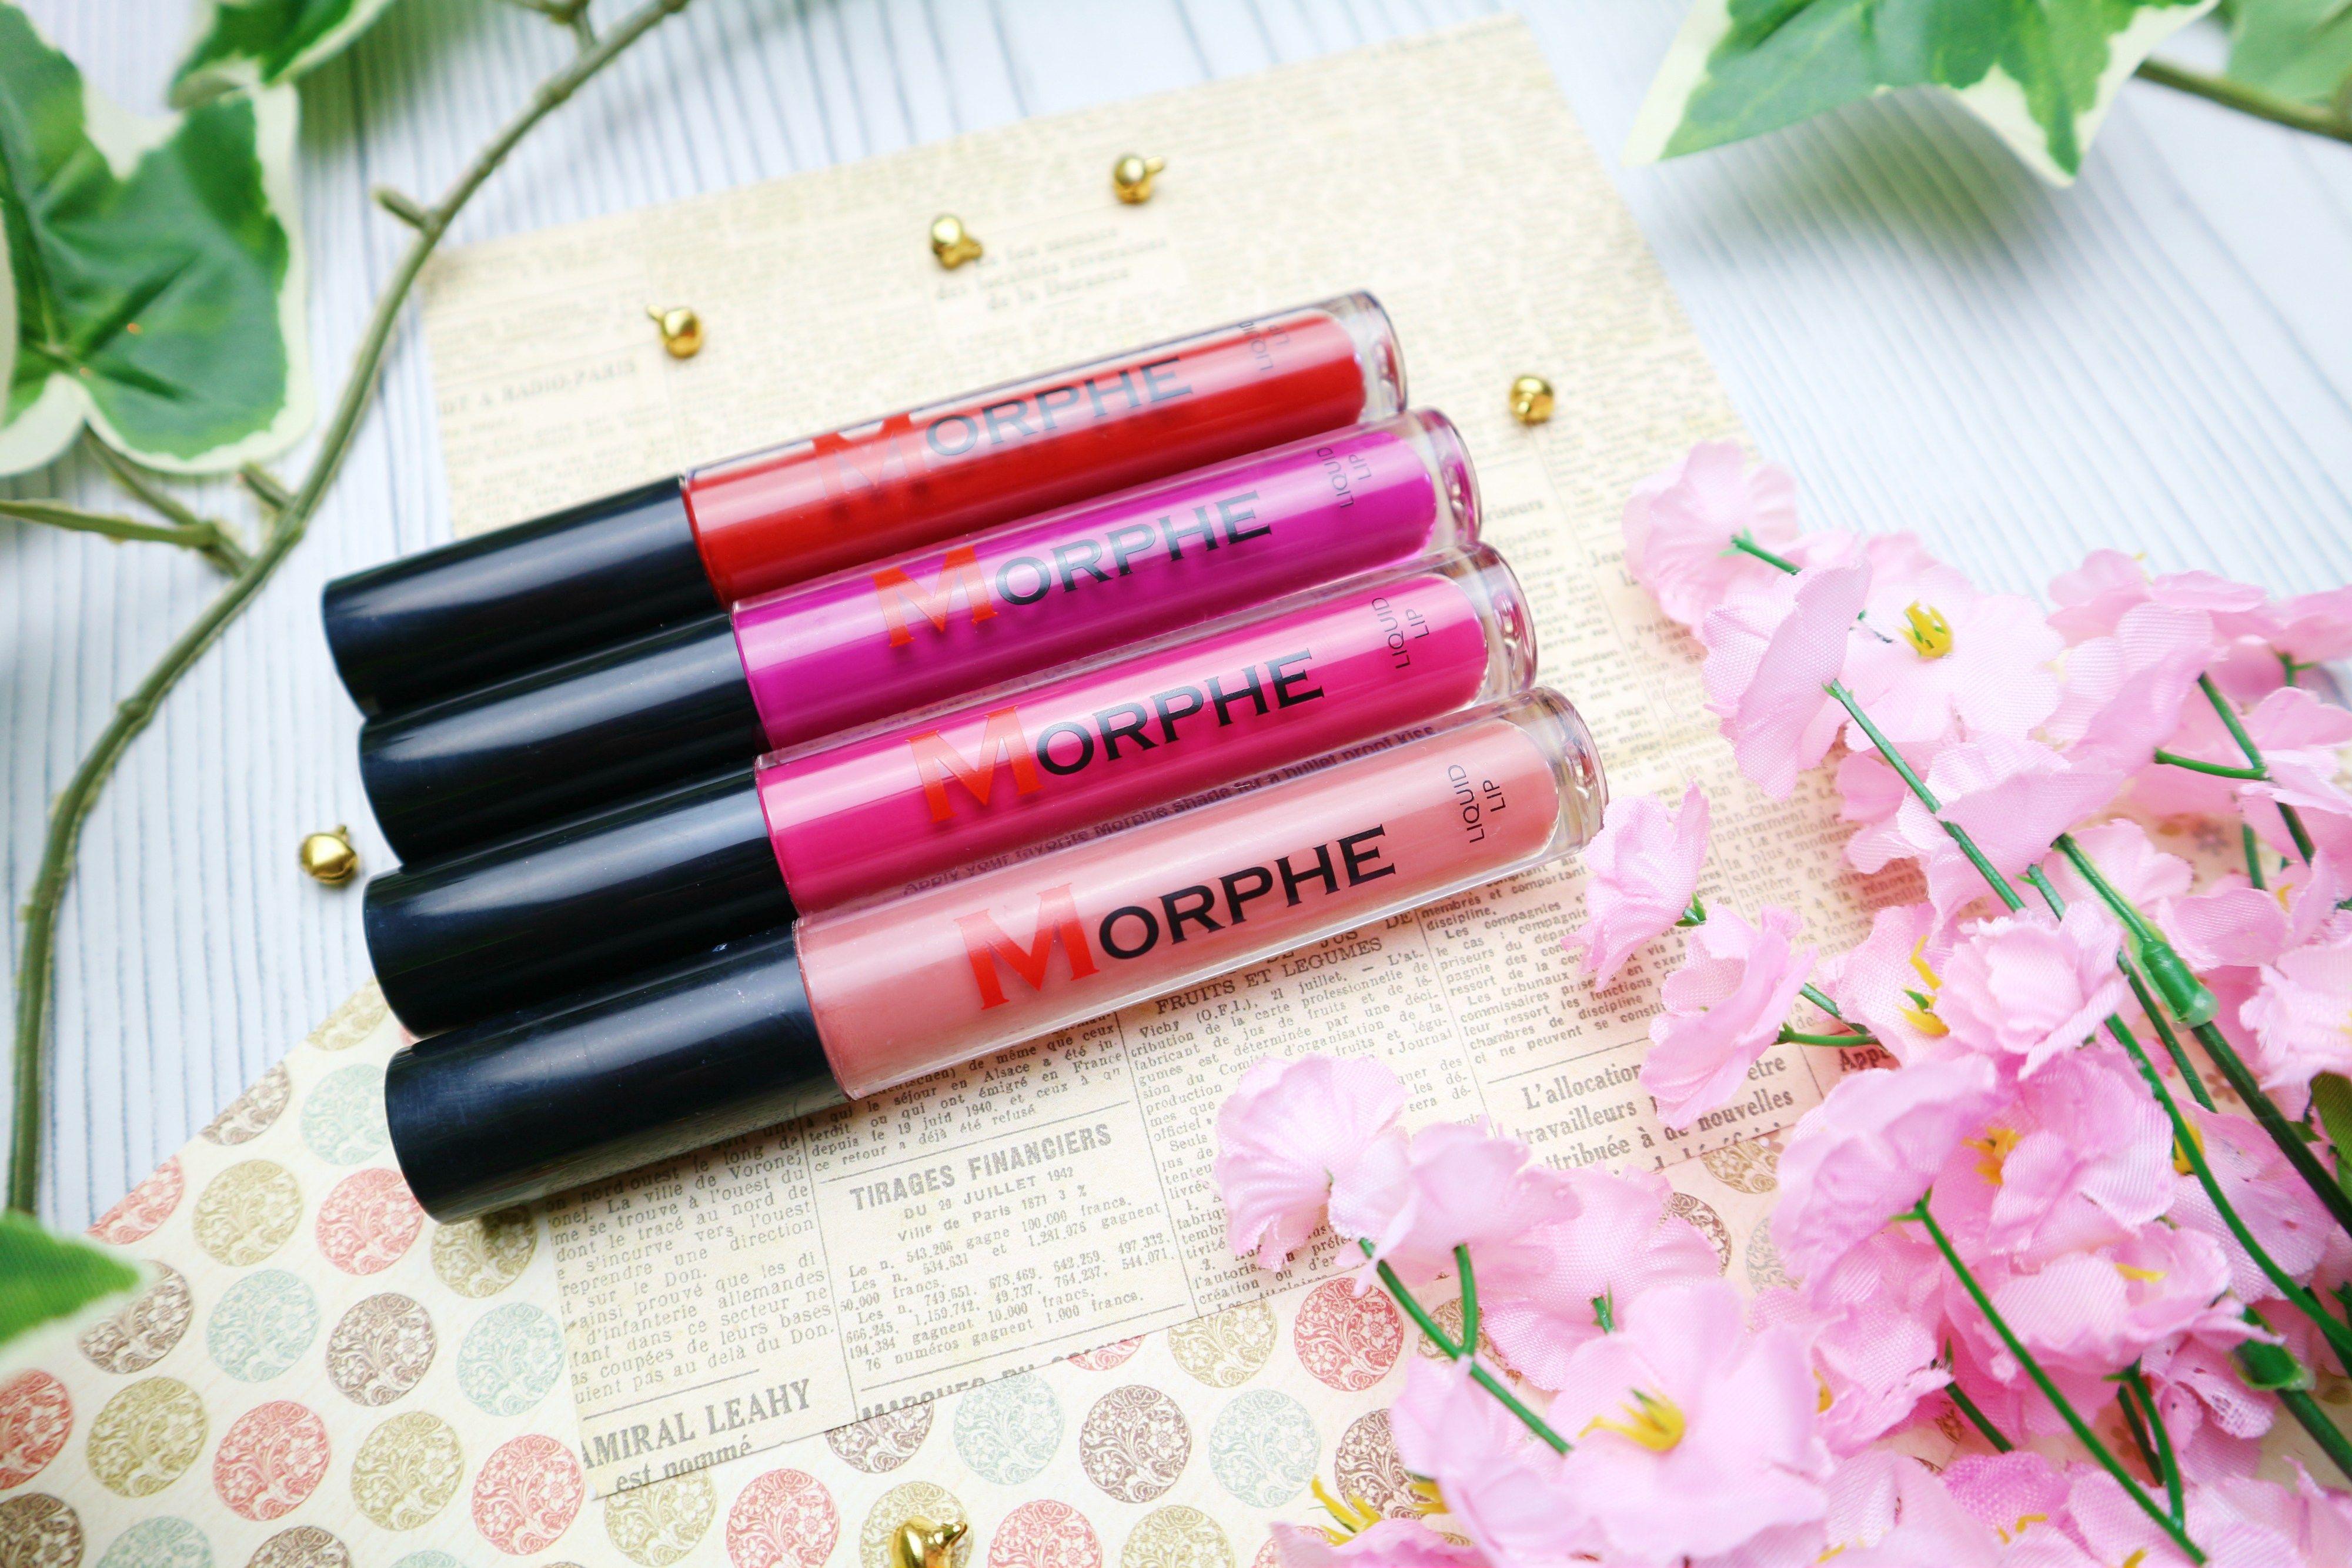 Morphe Liquid Lipsticks Swatches and Review Liquid